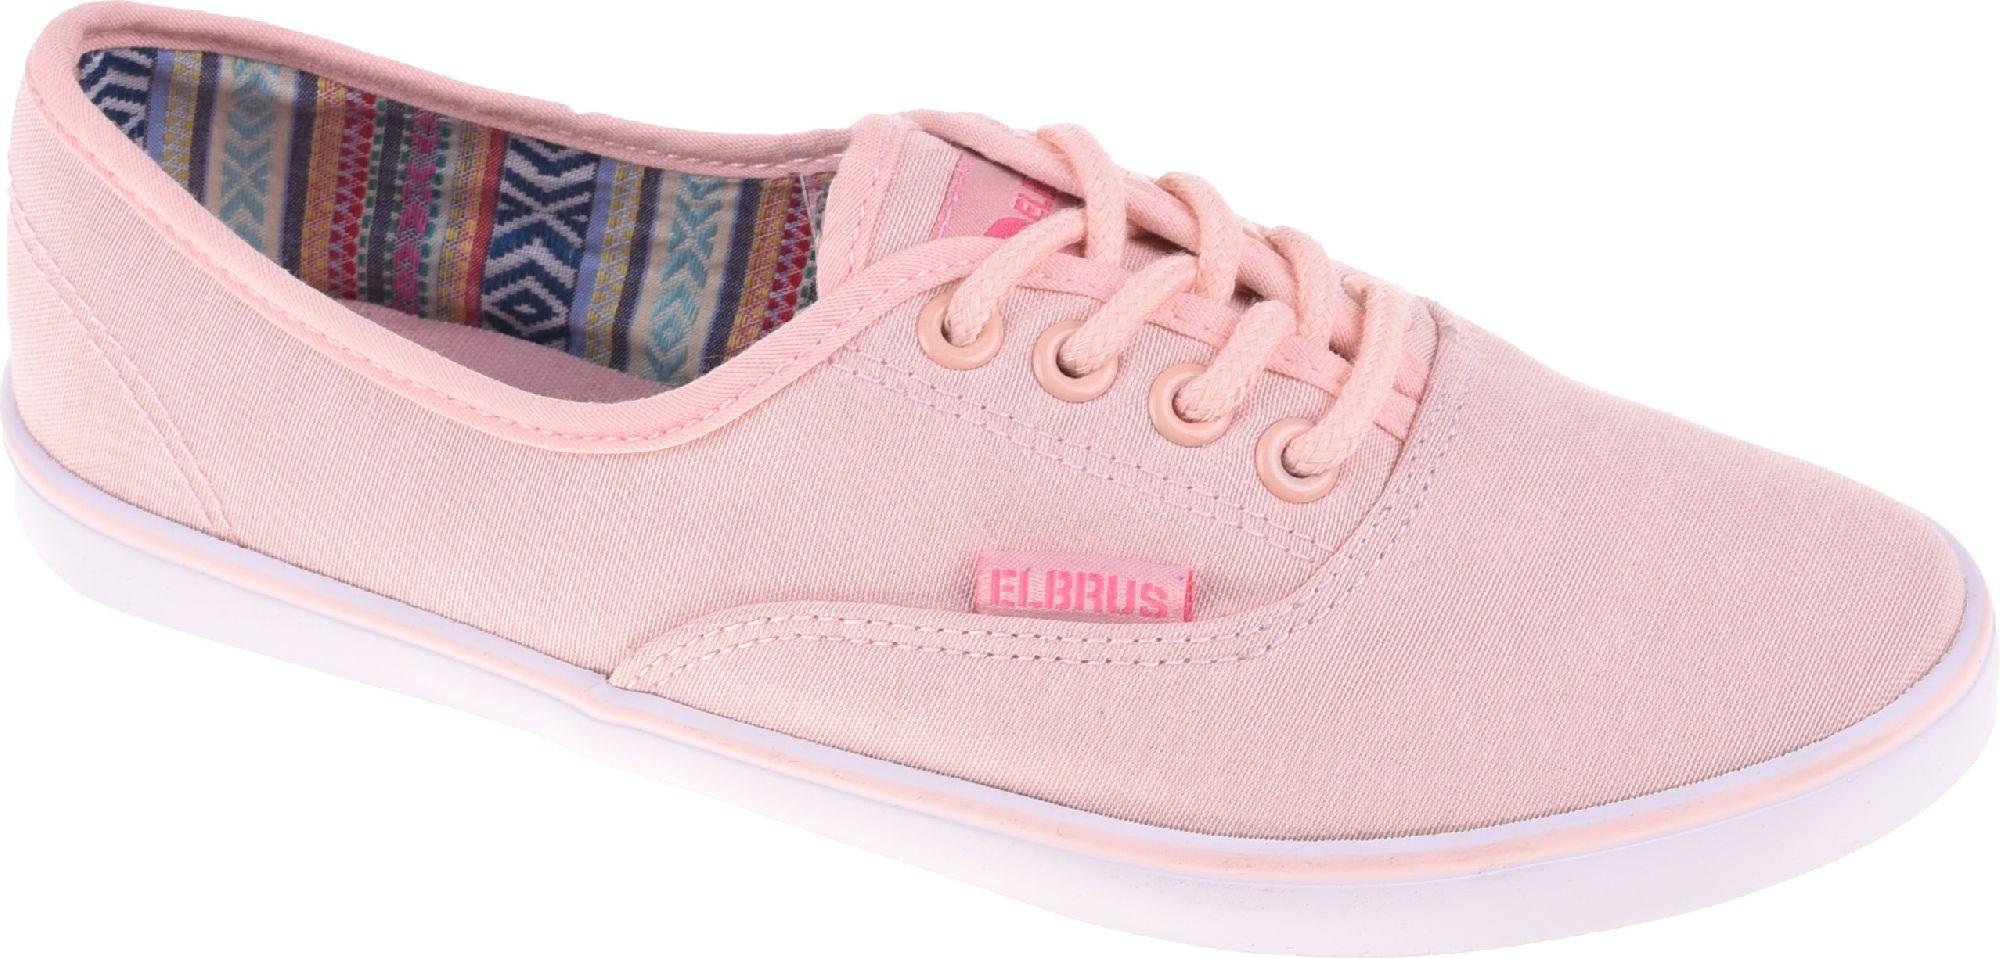 Elbrus Buty Damskie Marlene Wo's Old Pink r. 37 5901979148661